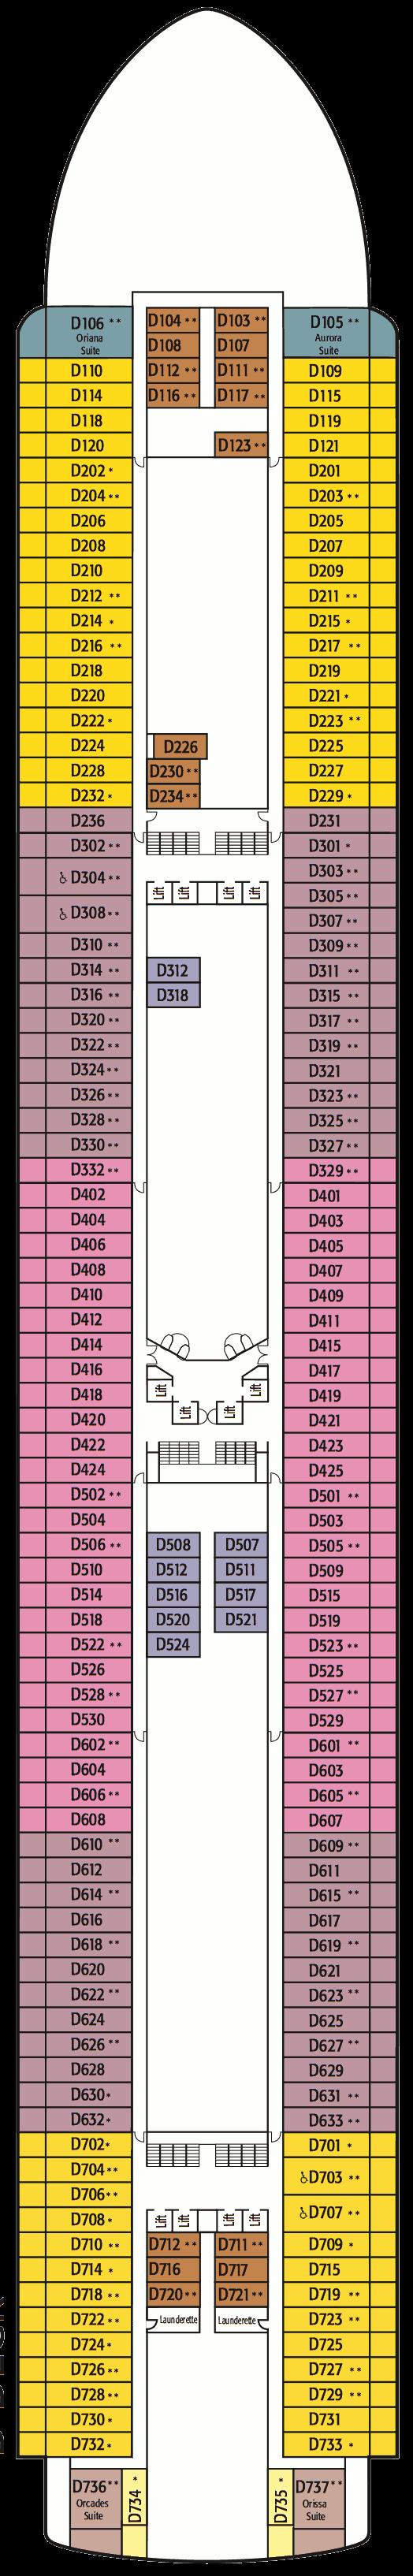 Azura Deck 9